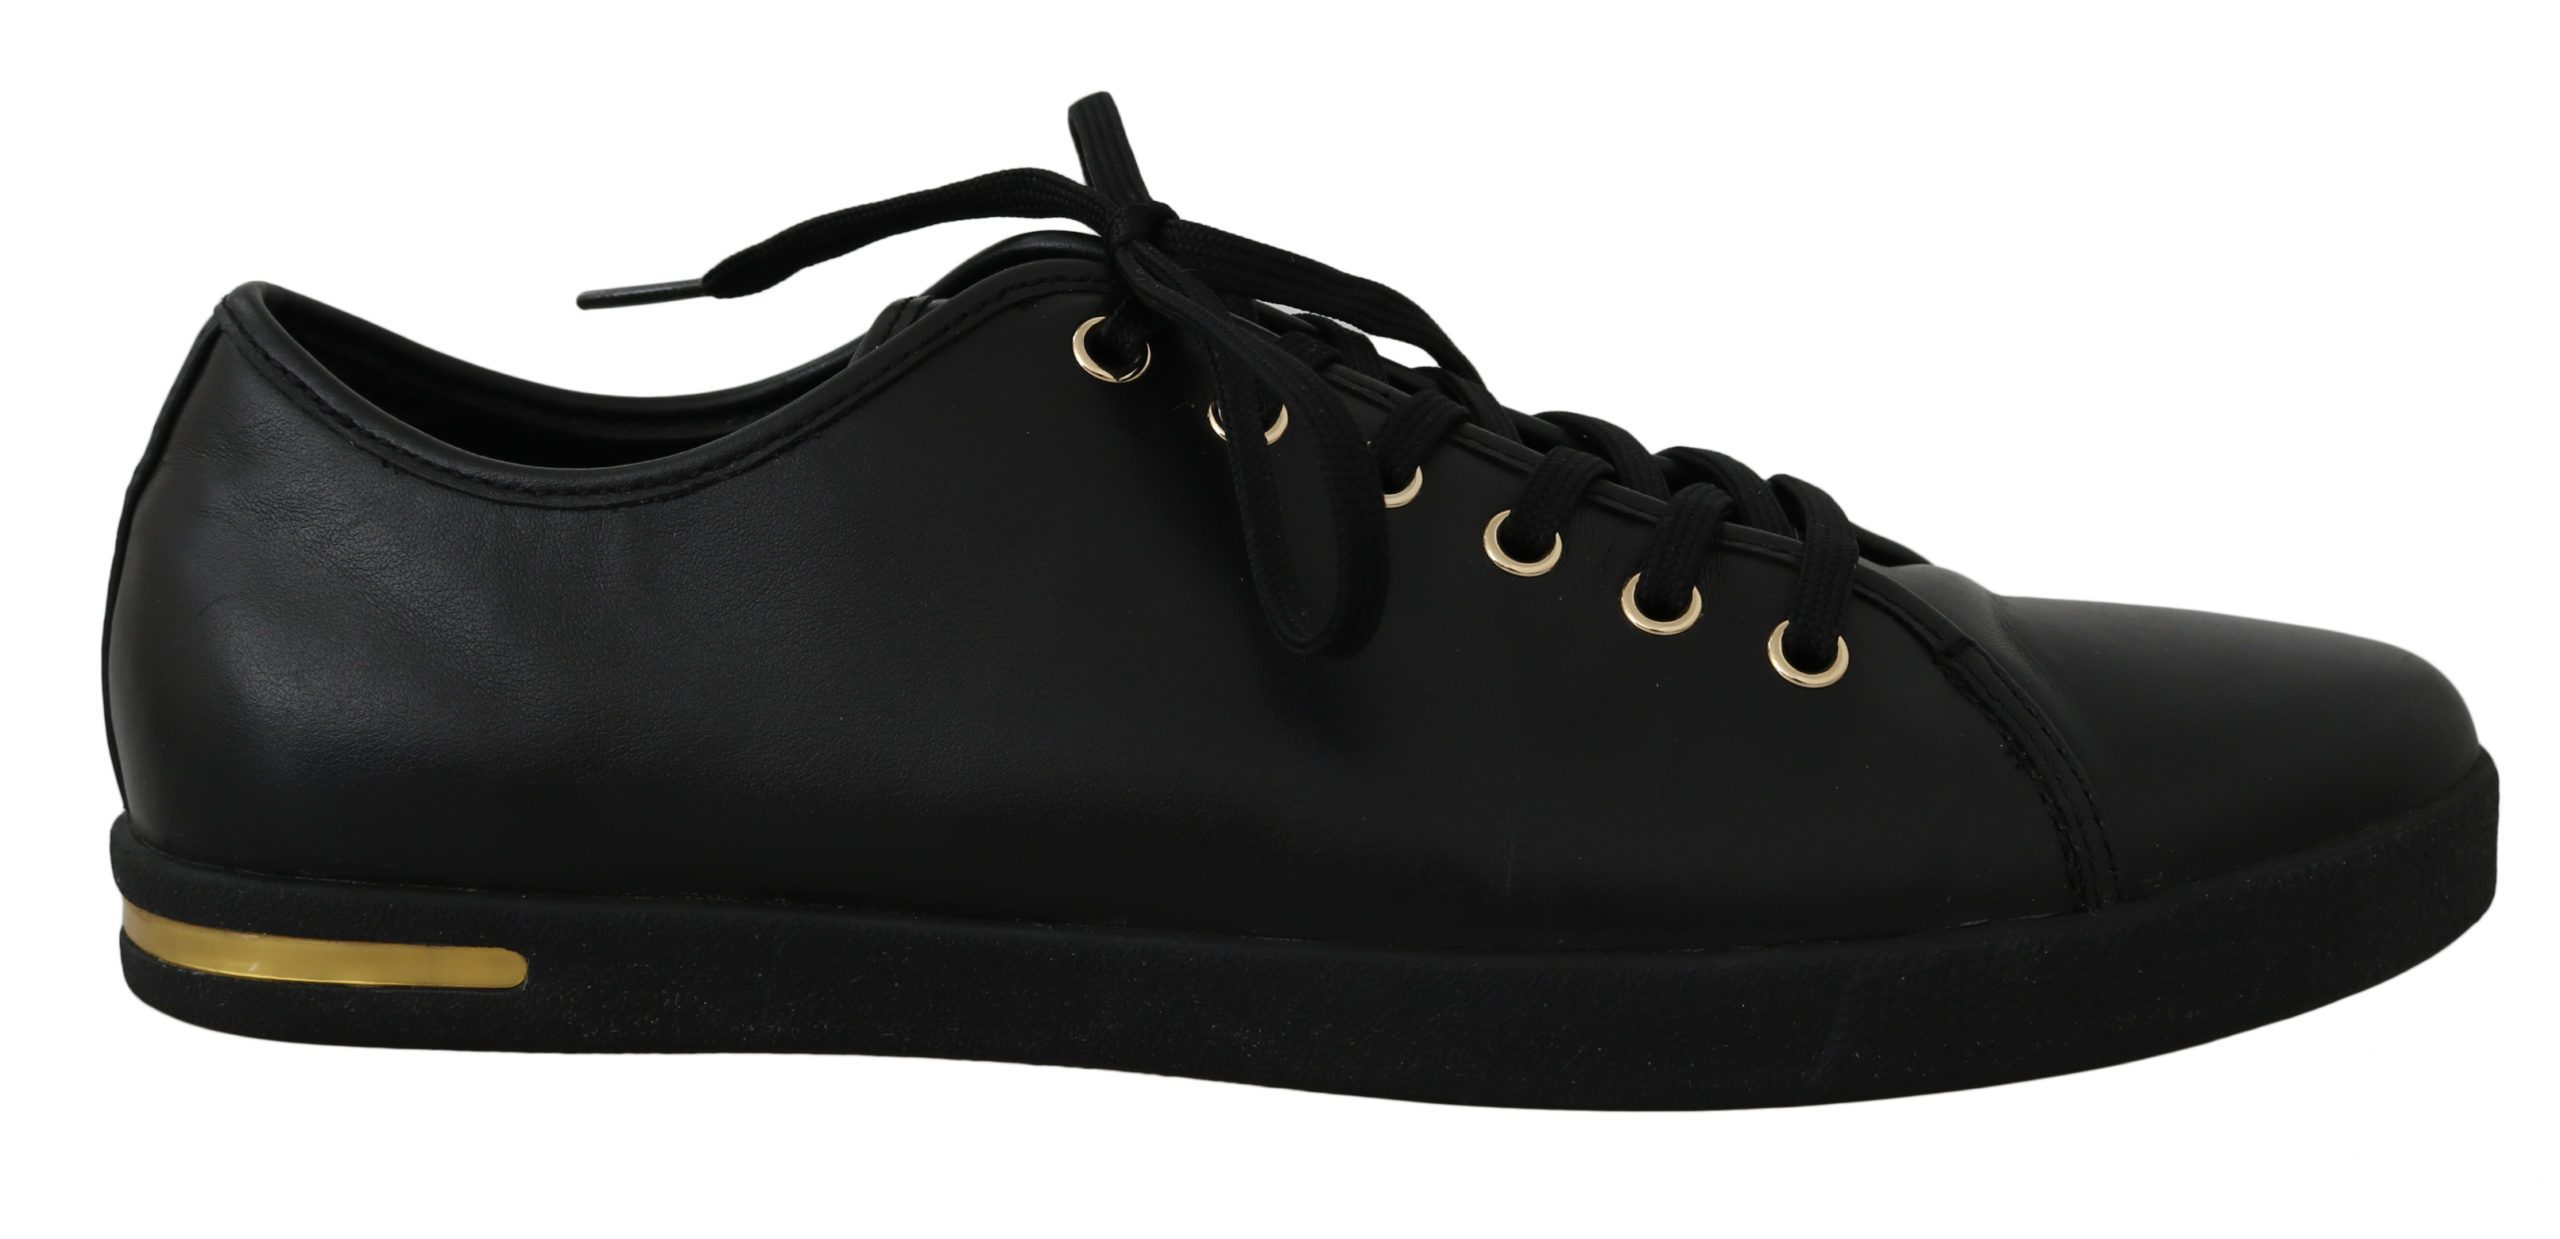 Dolce & Gabbana Women's Leather Solid Logo Trainer Black LA5817 - EU37/US6.5